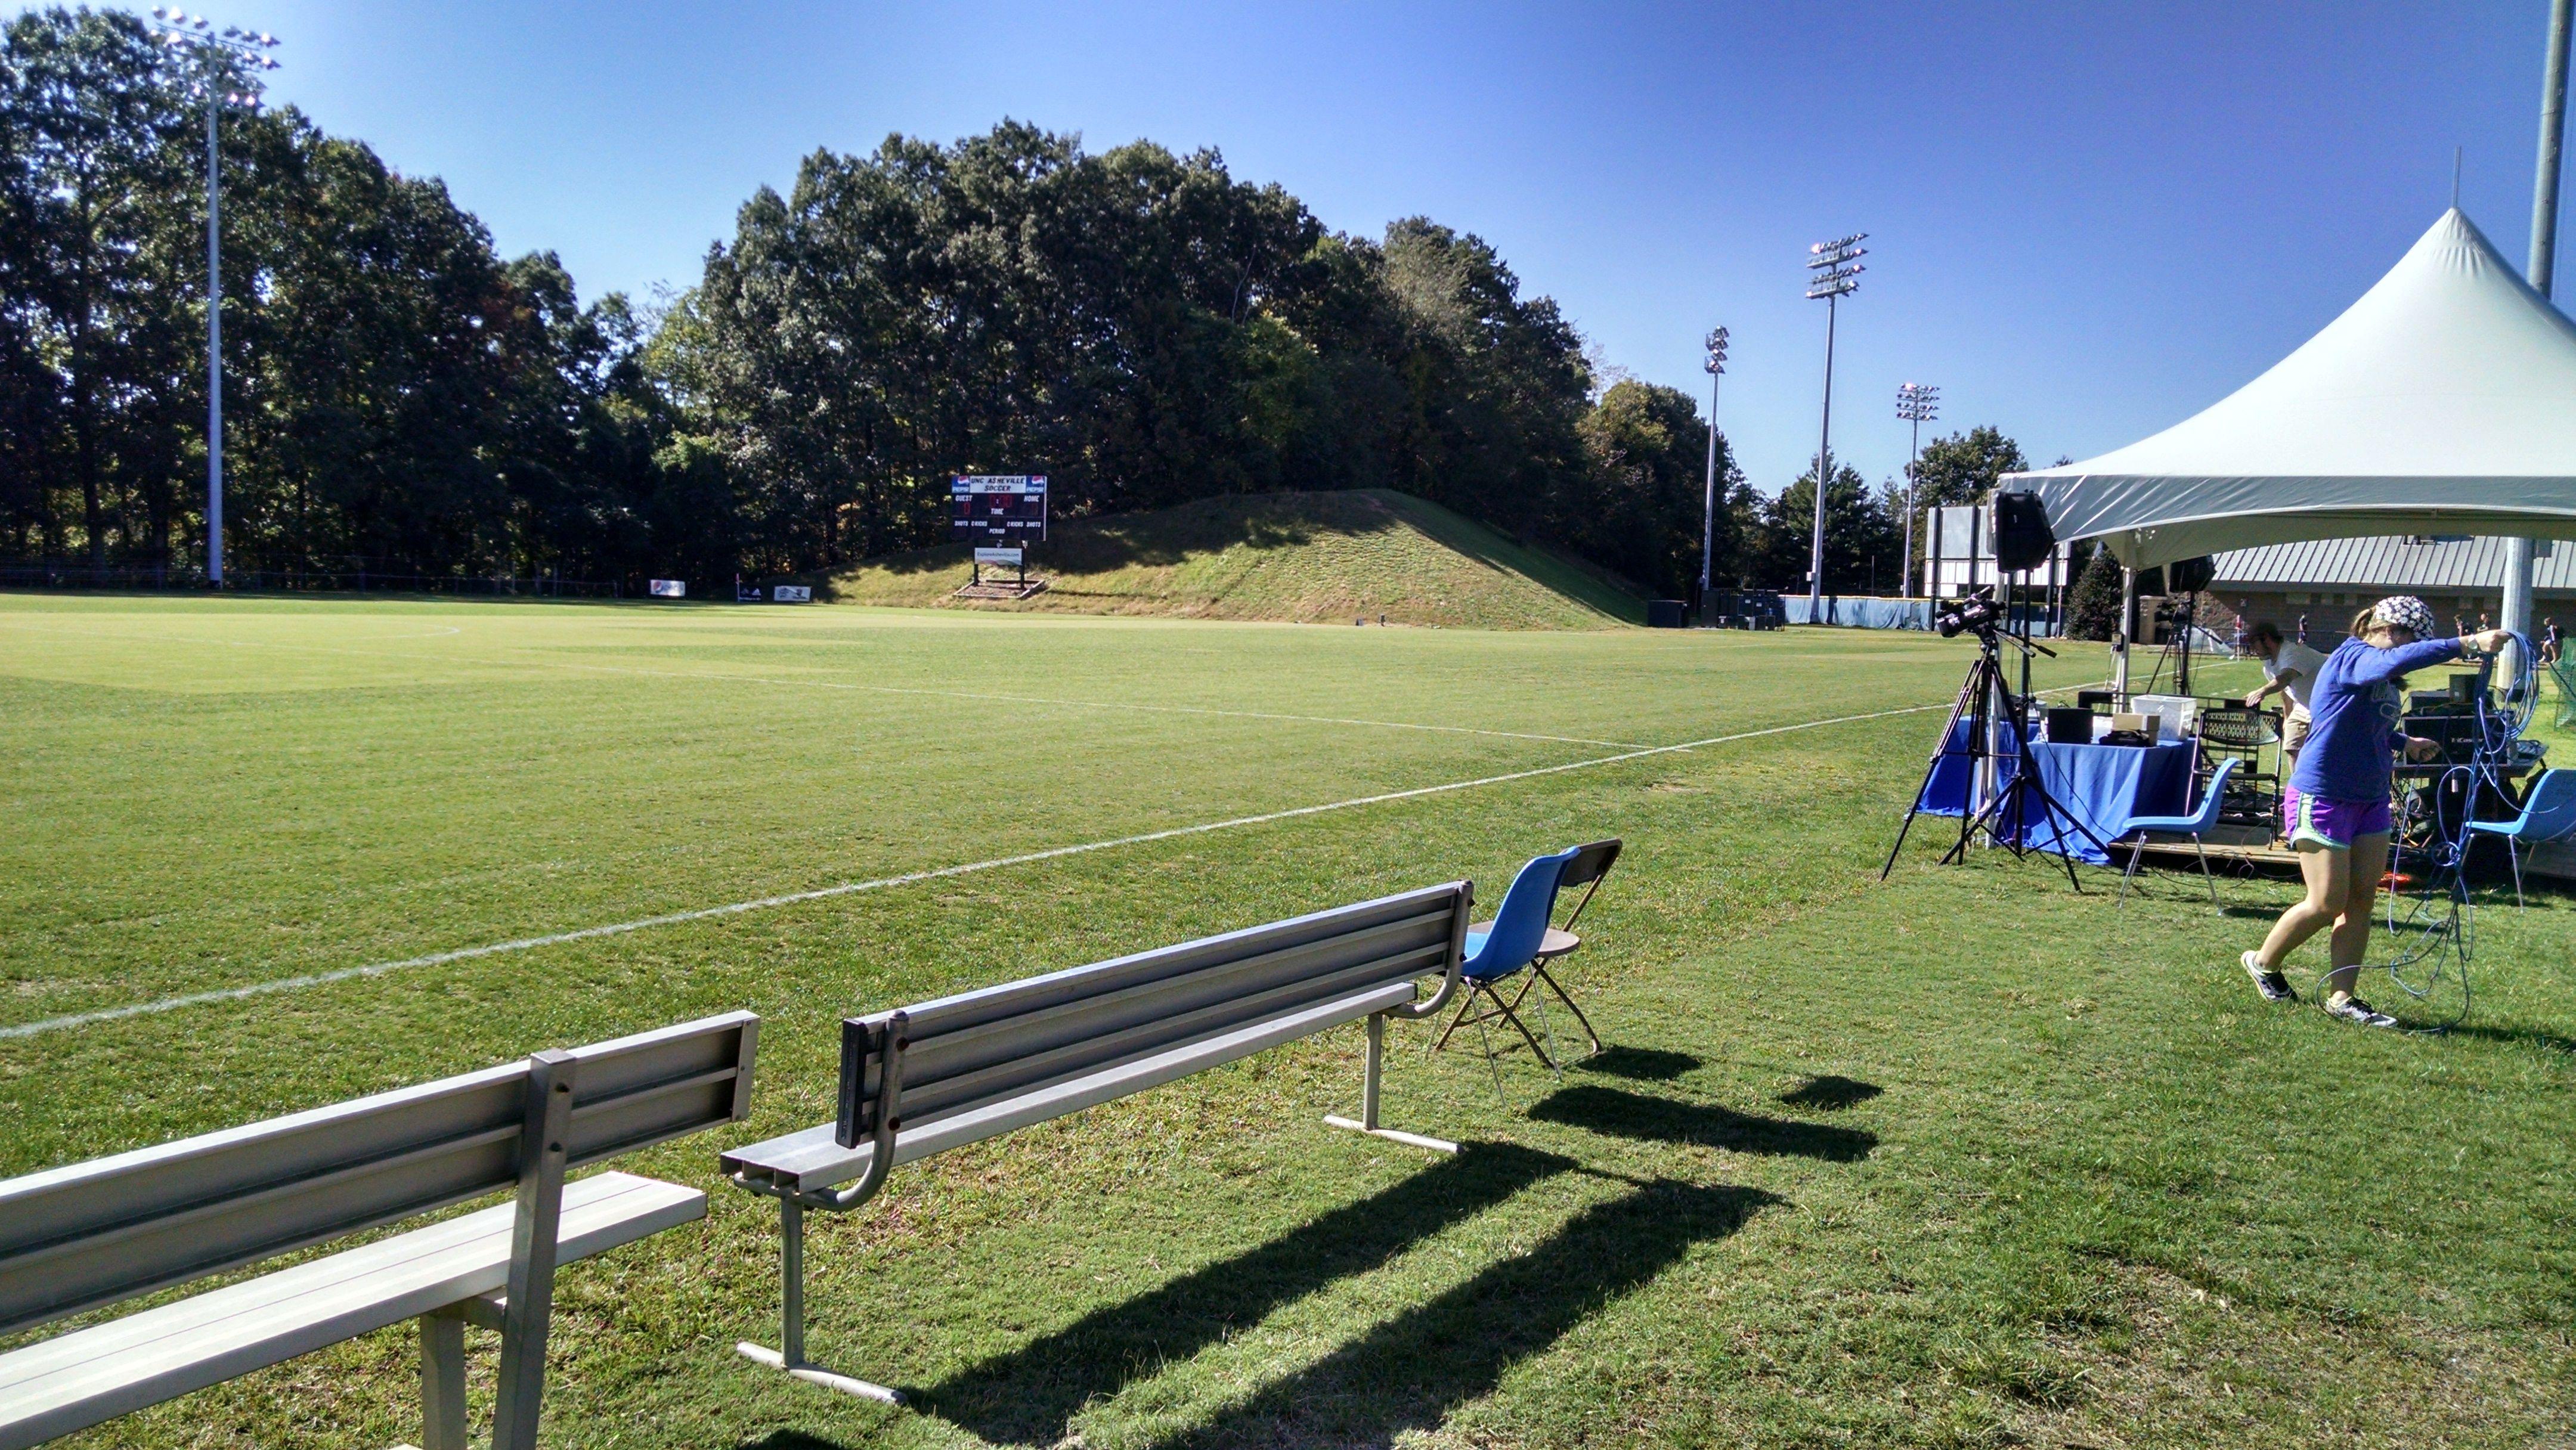 College soccer at UNCA. October 2014. College soccer